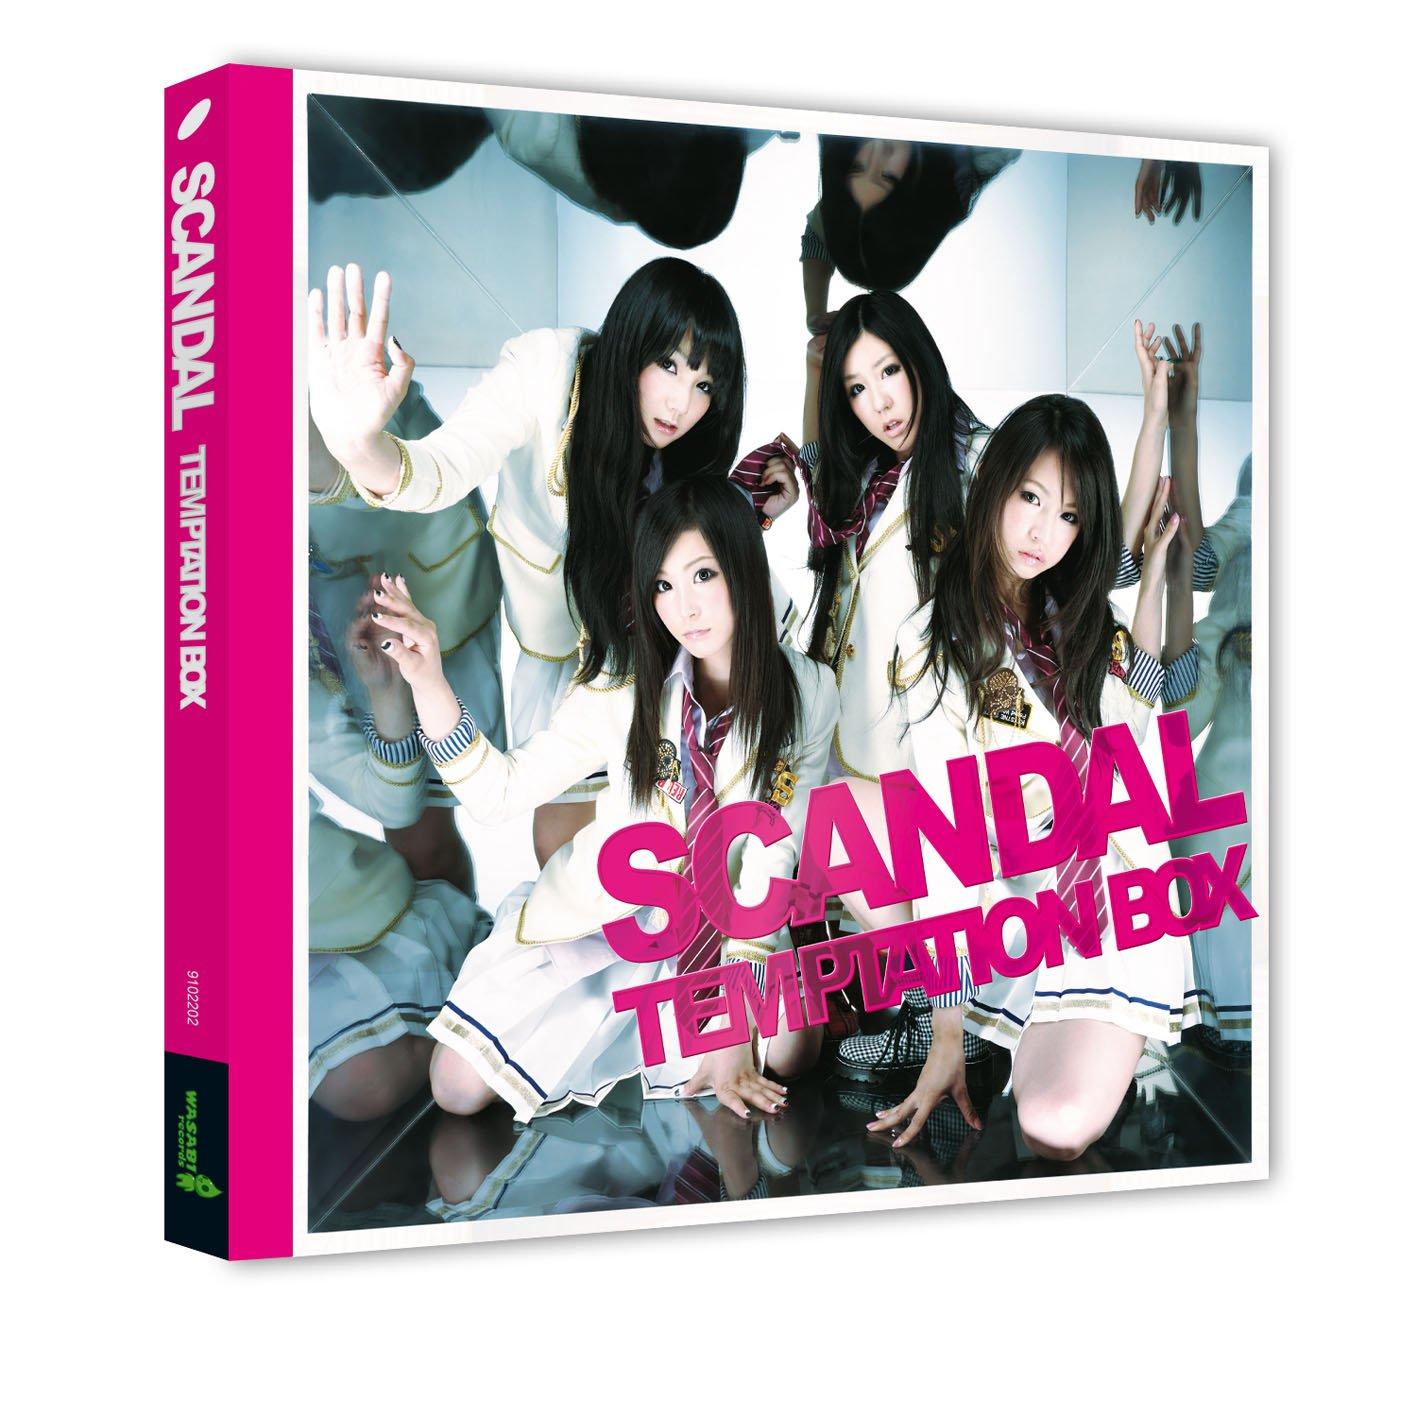 SCANDAL - TEMPTATION BOX (2010) [FLAC] Download